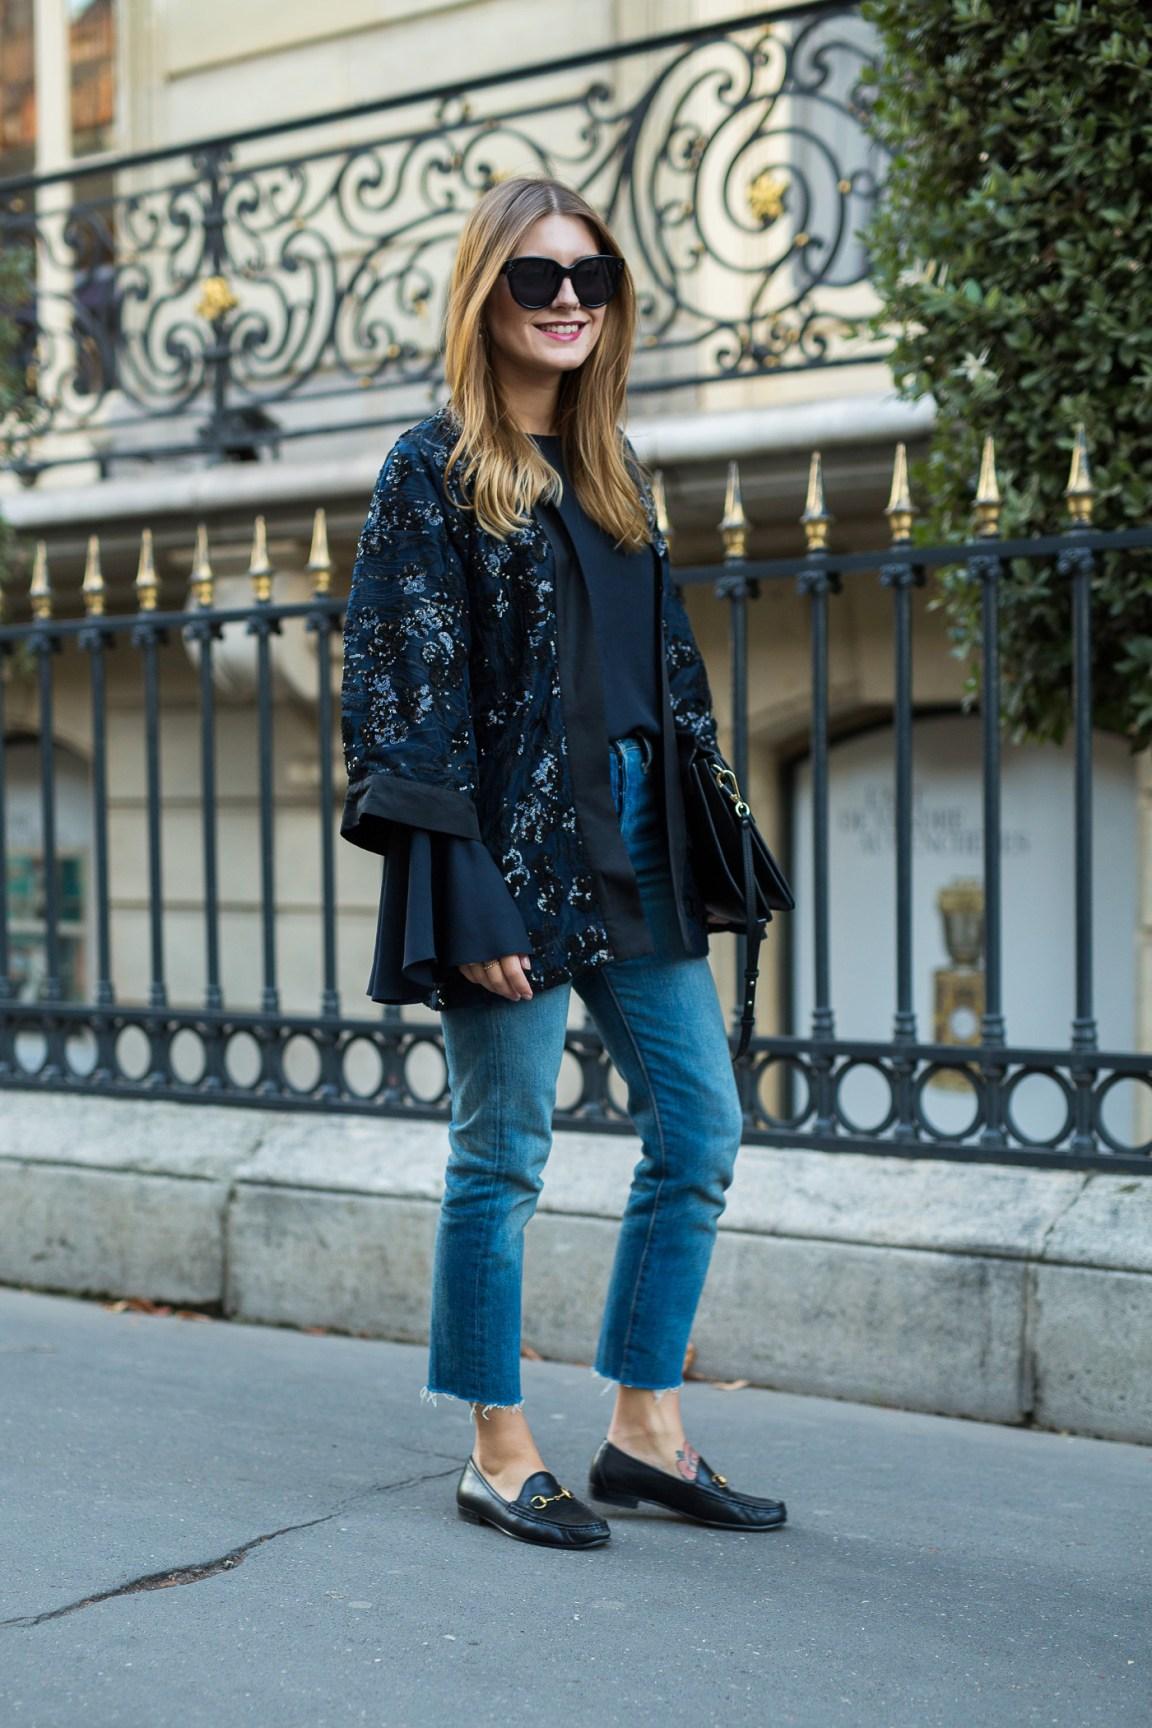 paris_fashion_week_kimono_and_bell_sleeves_5